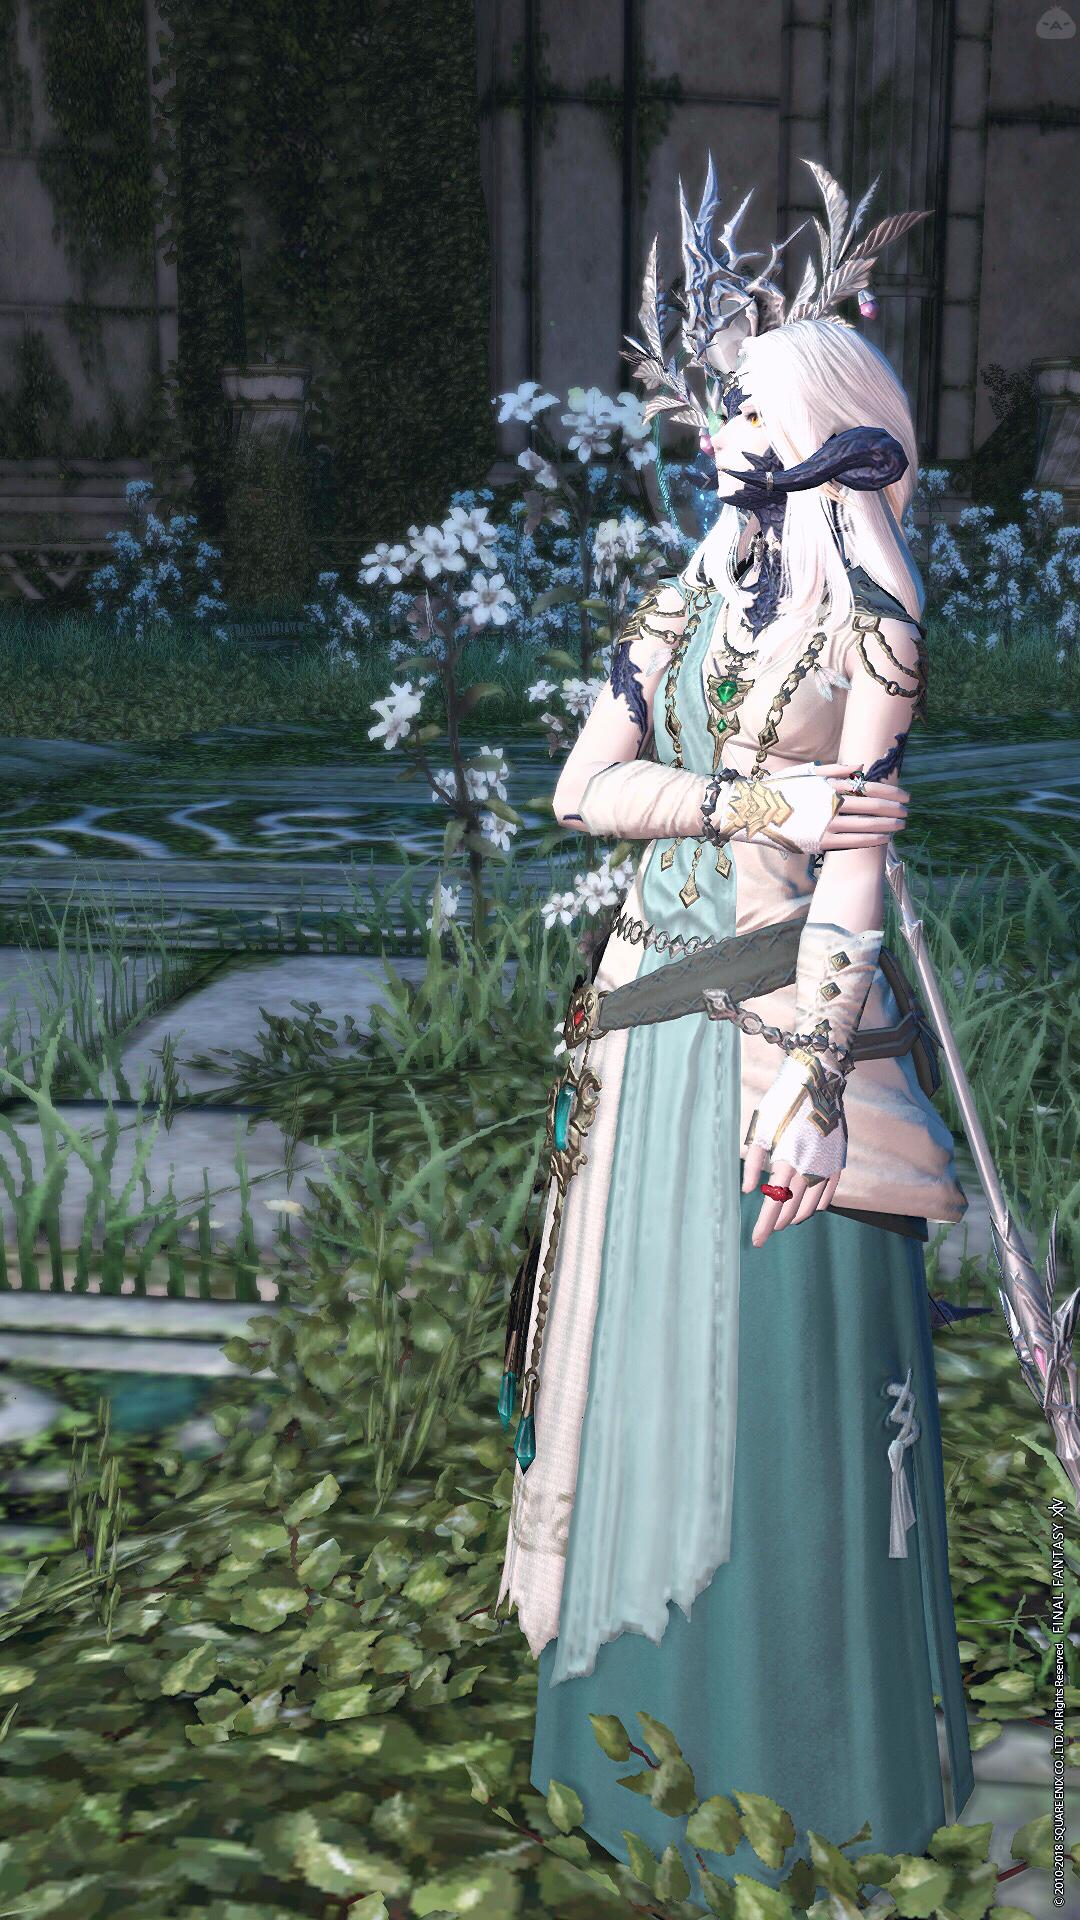 mermaid's bouquet